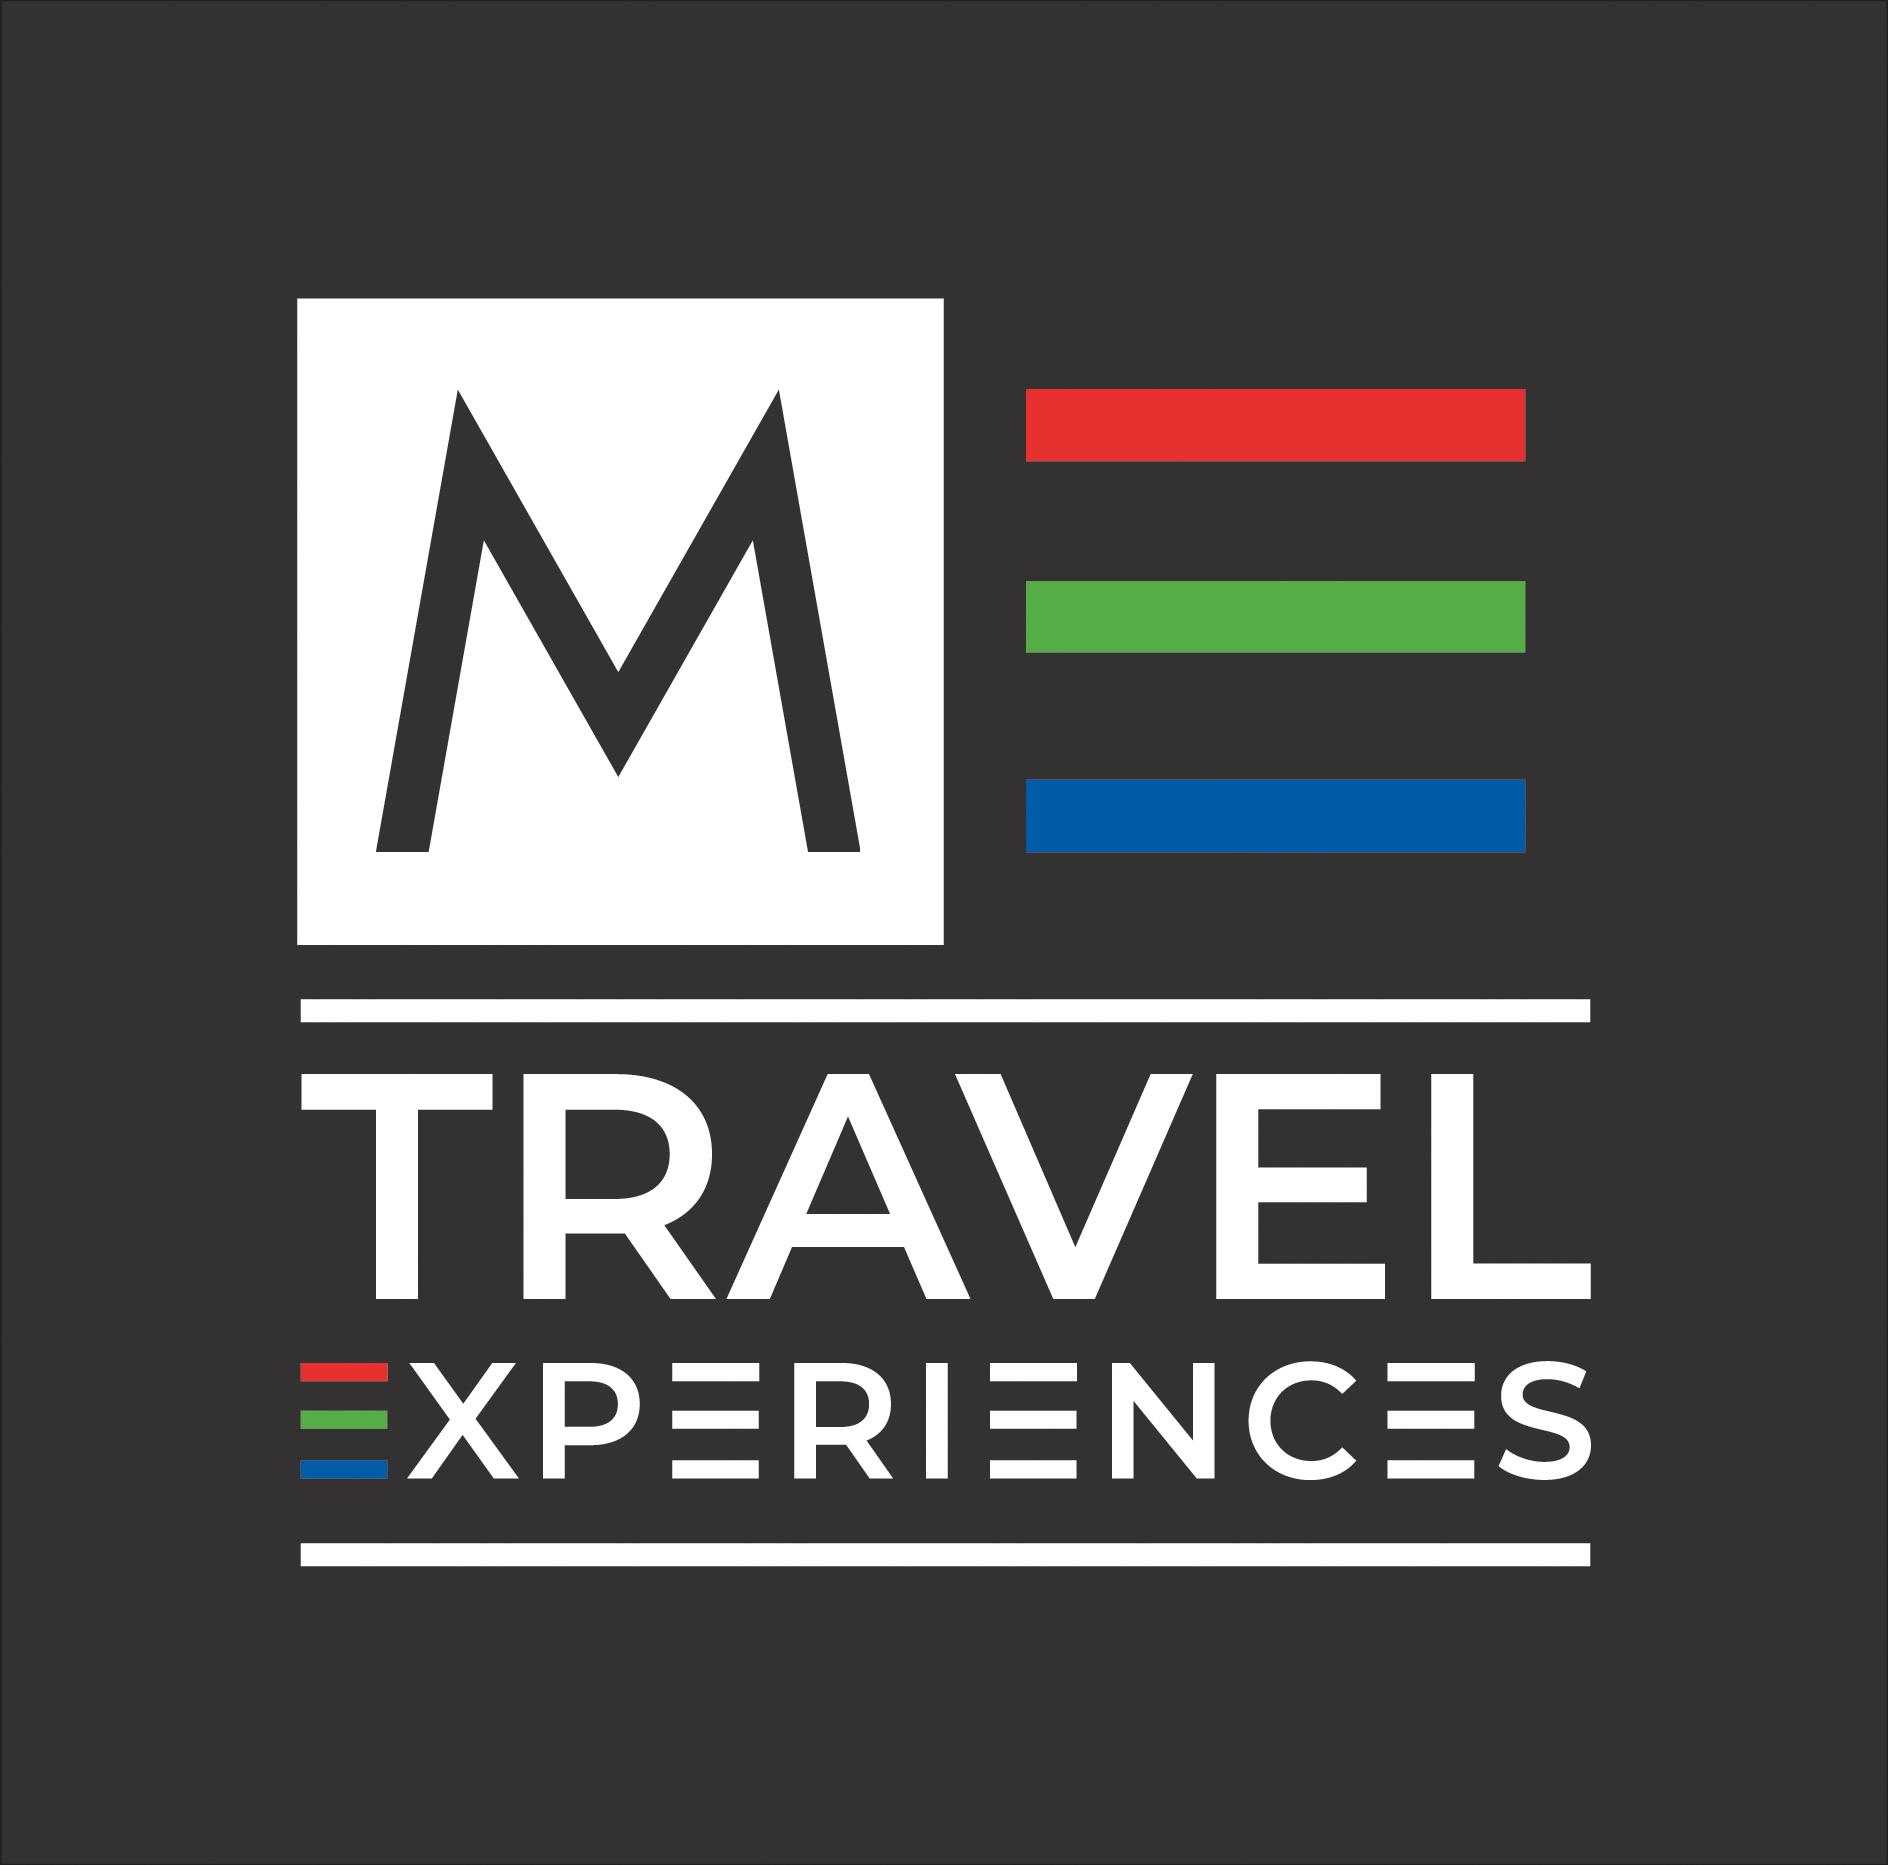 M-TRAVEL EXPERIENCES